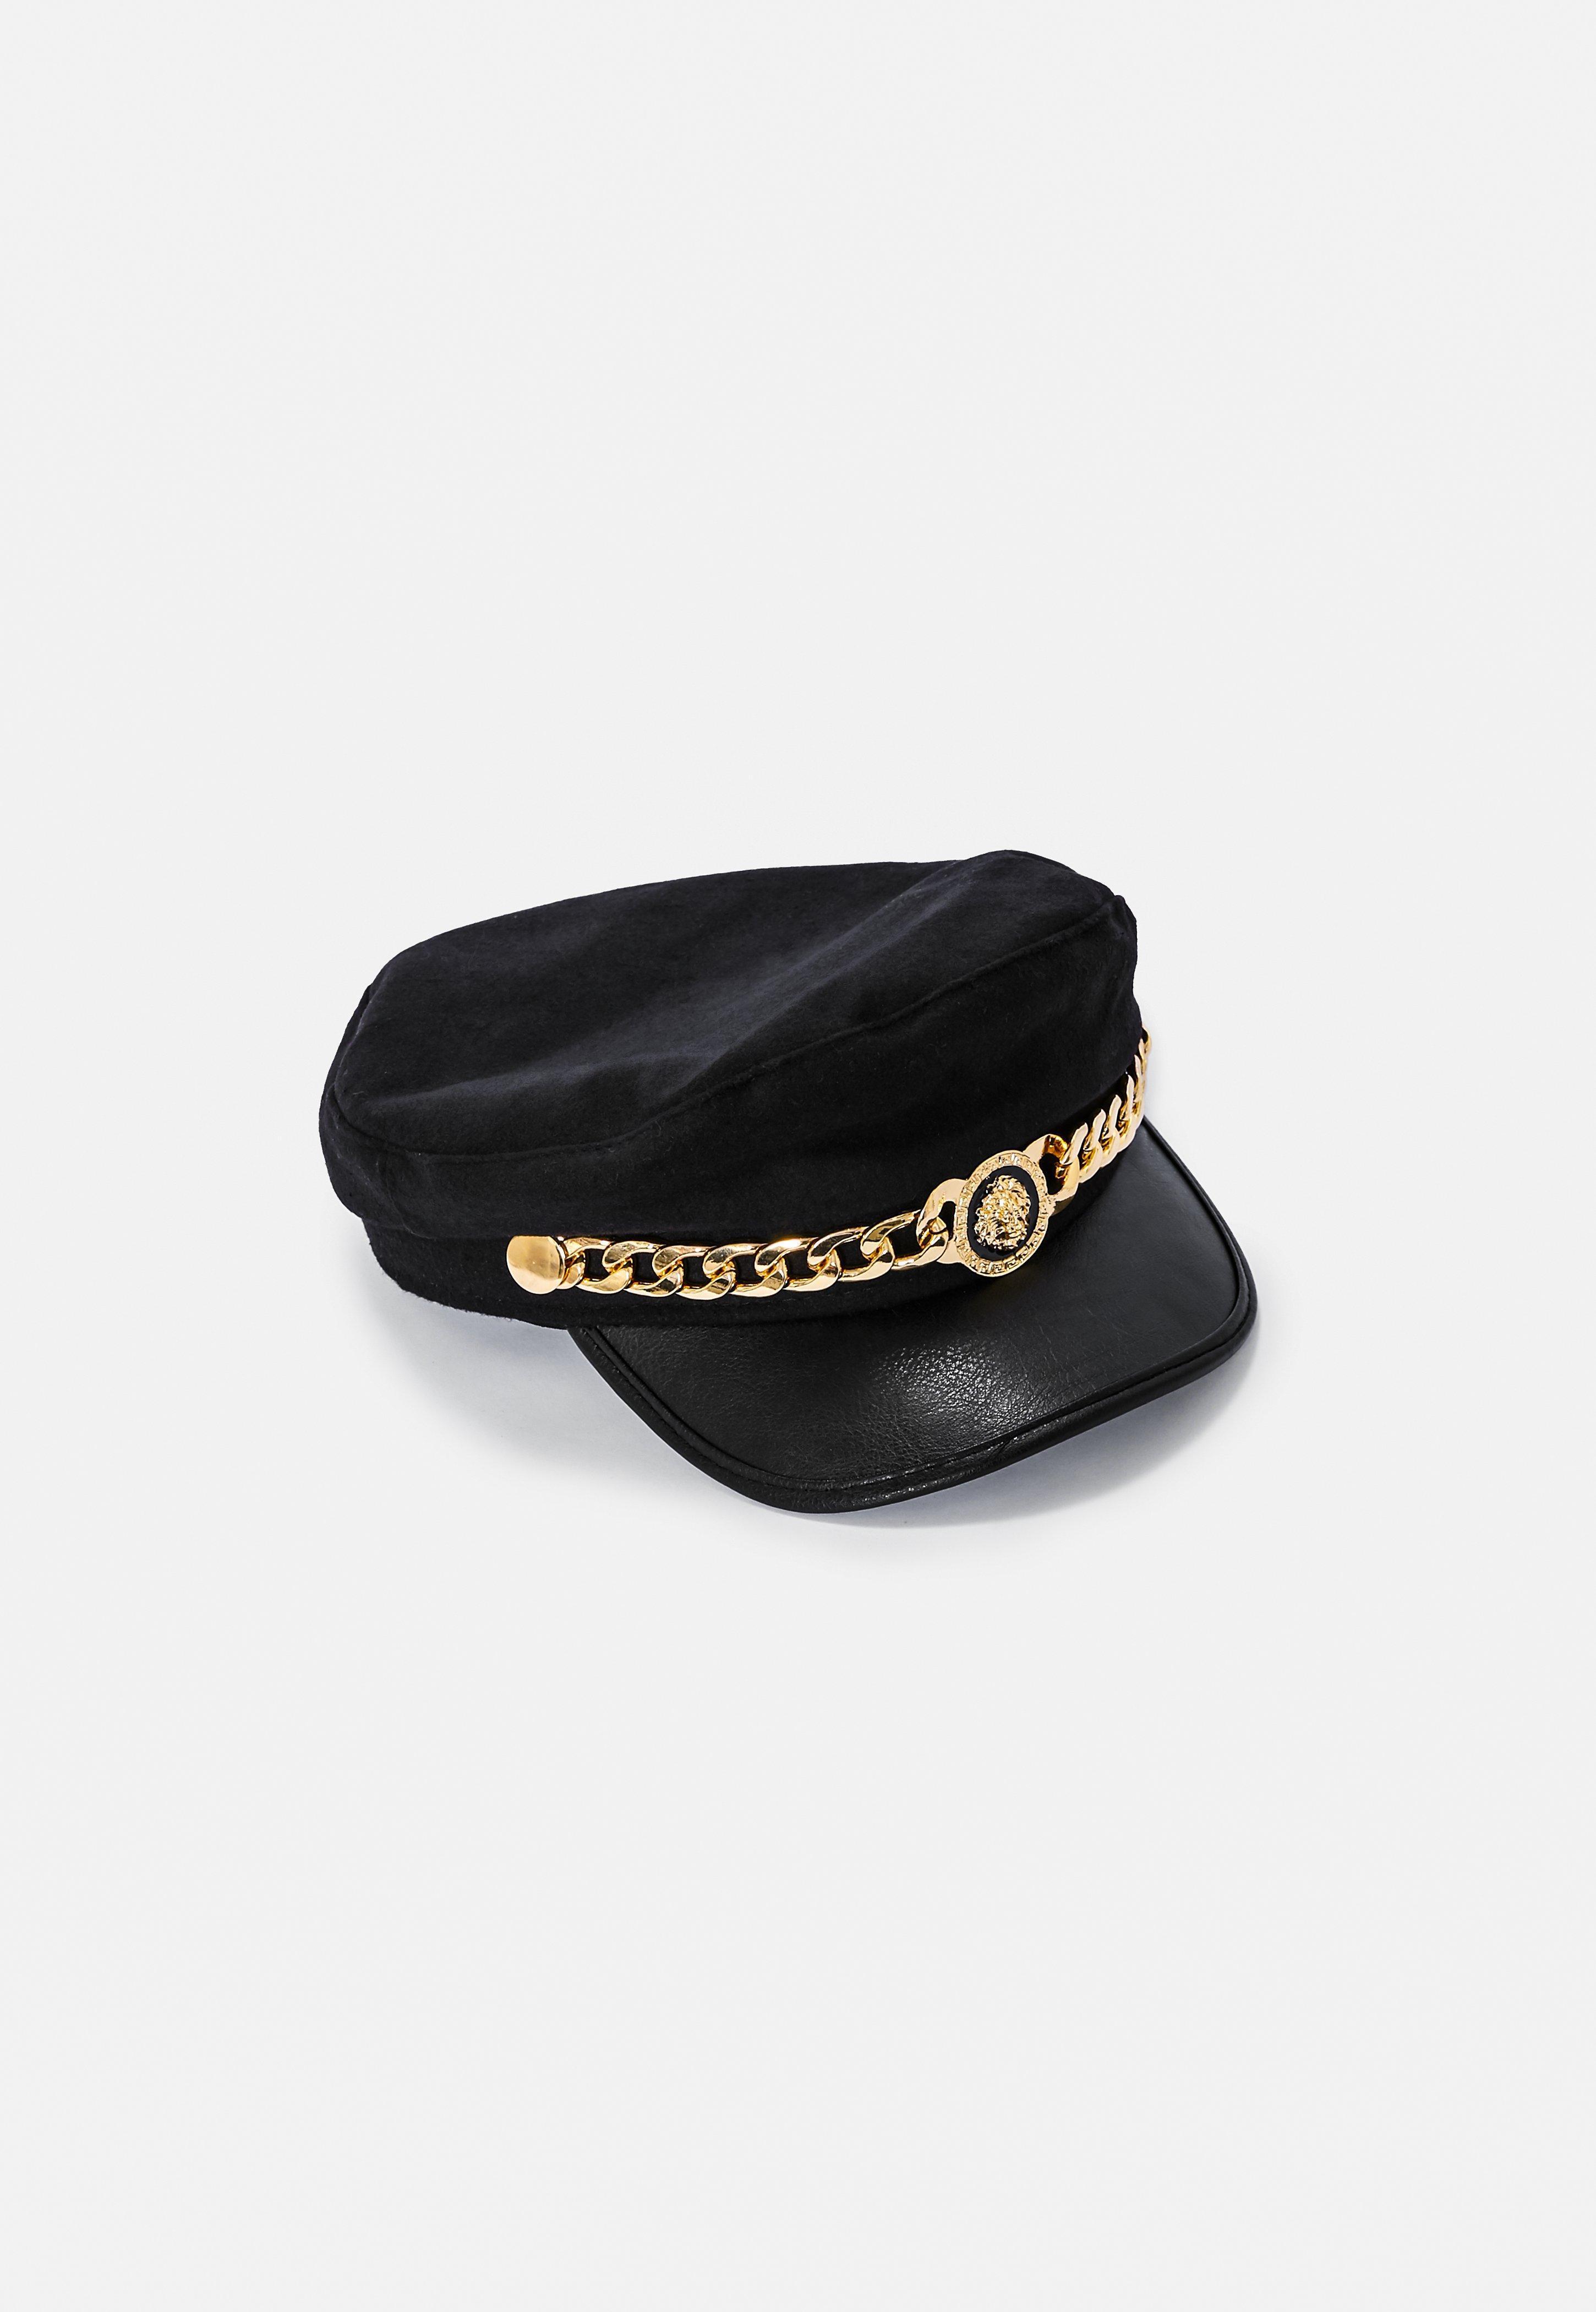 6f70ef1aef2 Lyst - Missguided Black Lion Head Baker Boy Hat in Black